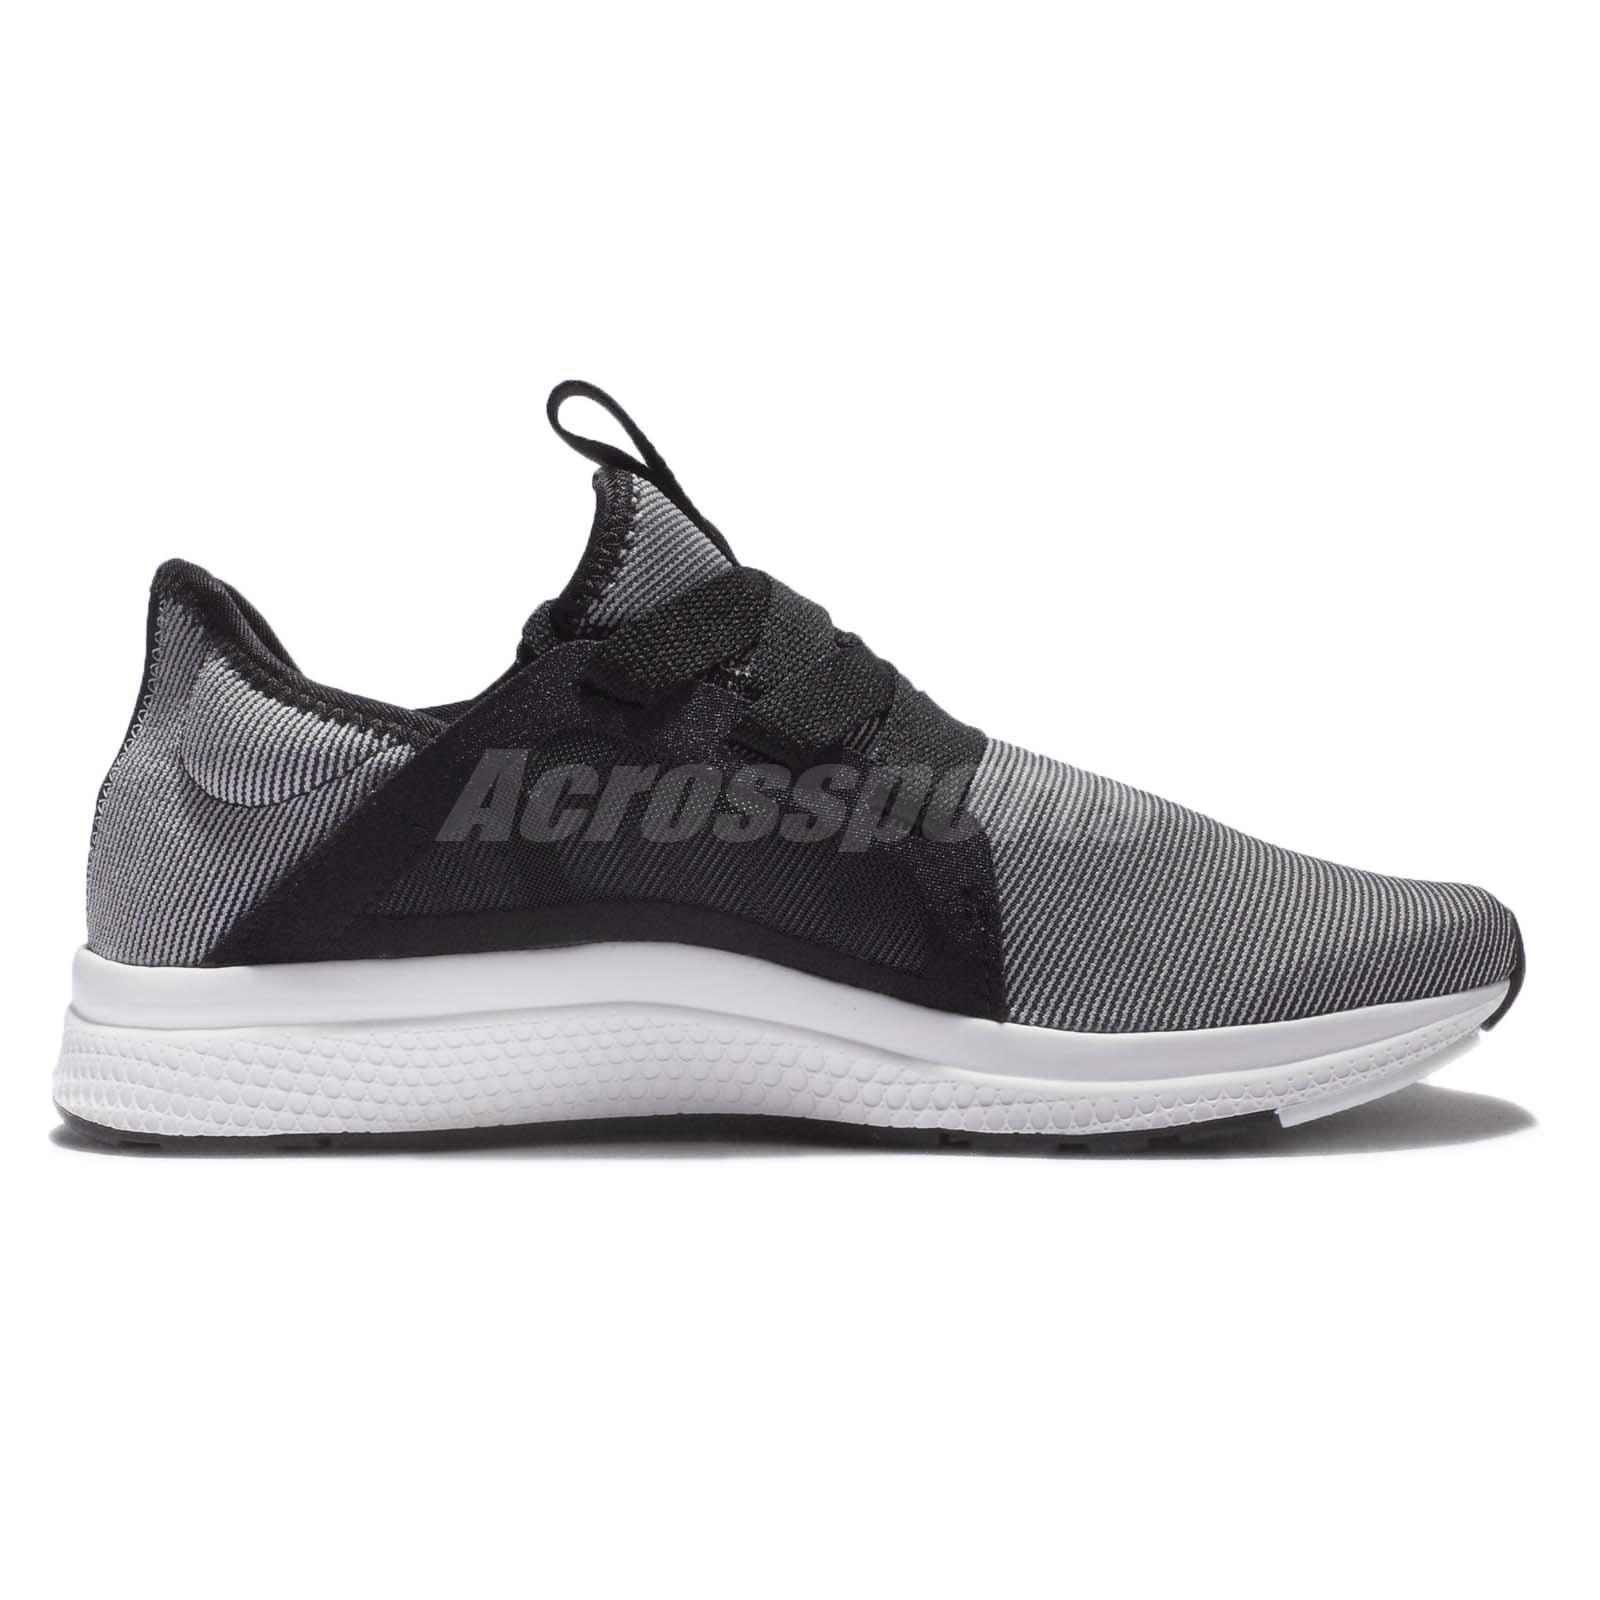 adidas Edge Lux W BOUNCE Black Grey White Women Running